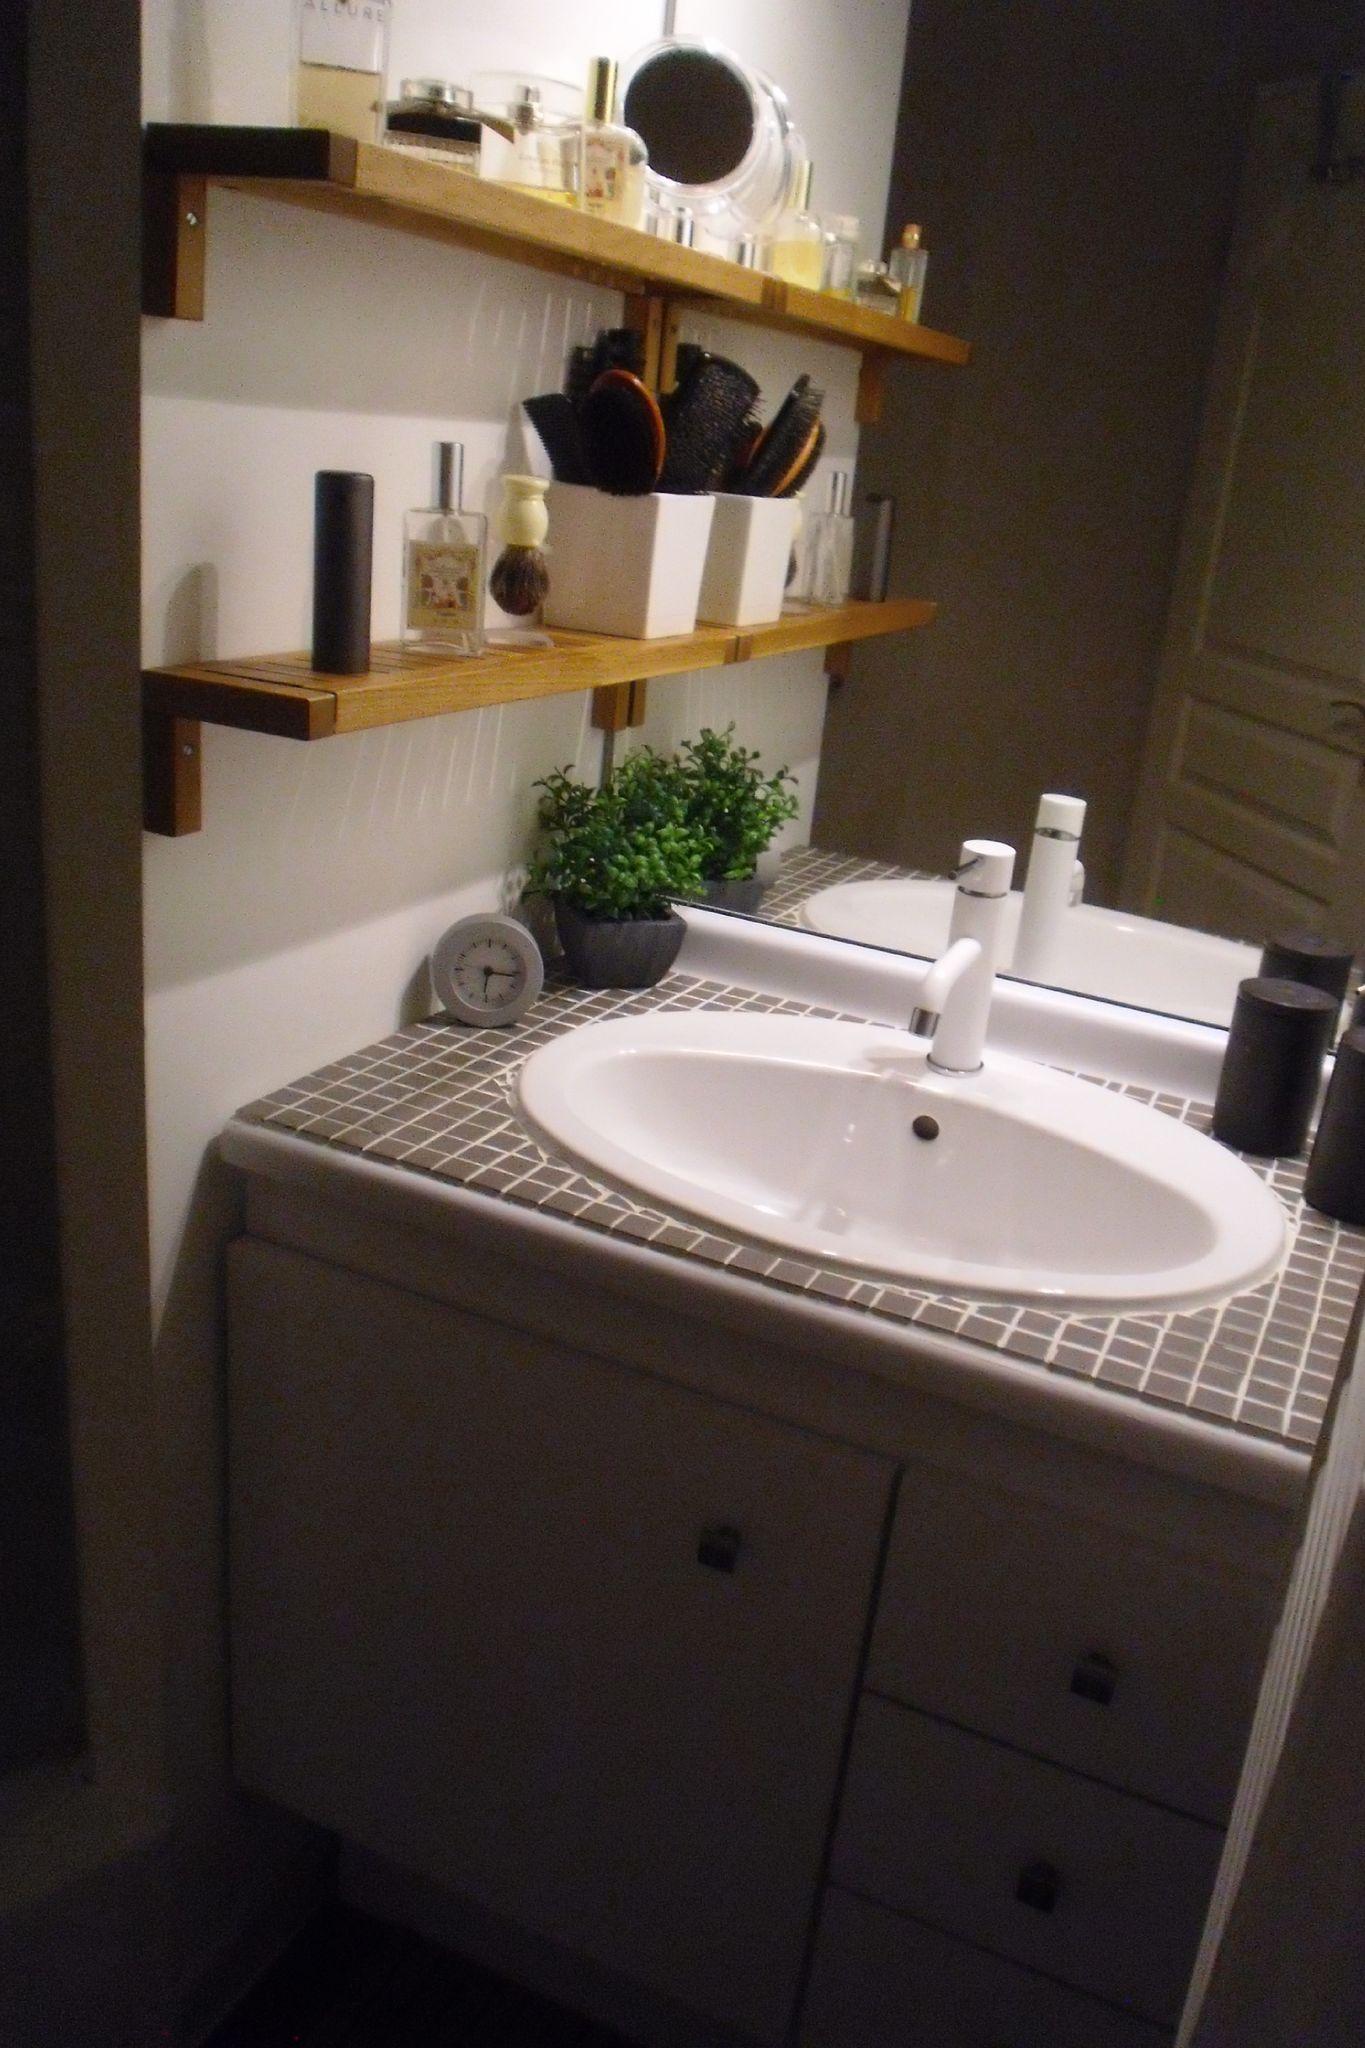 Moderniser Salle De Bain comment relooker sa salle de bain - mon blabla de fille